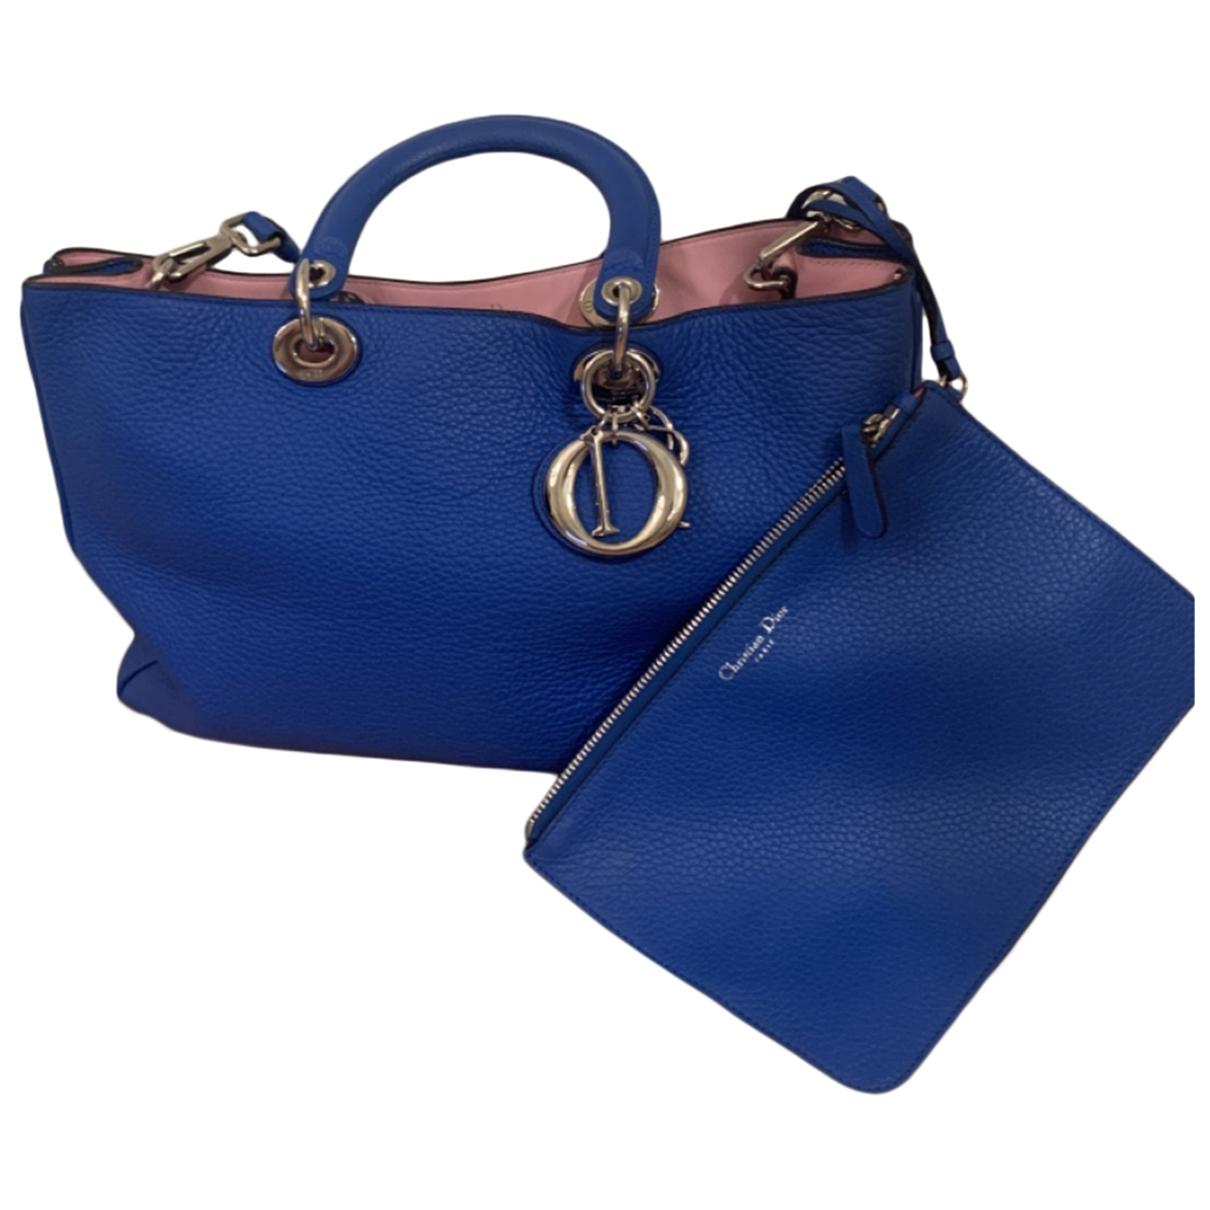 Dior Diorissimo Blue Leather handbag for Women \N